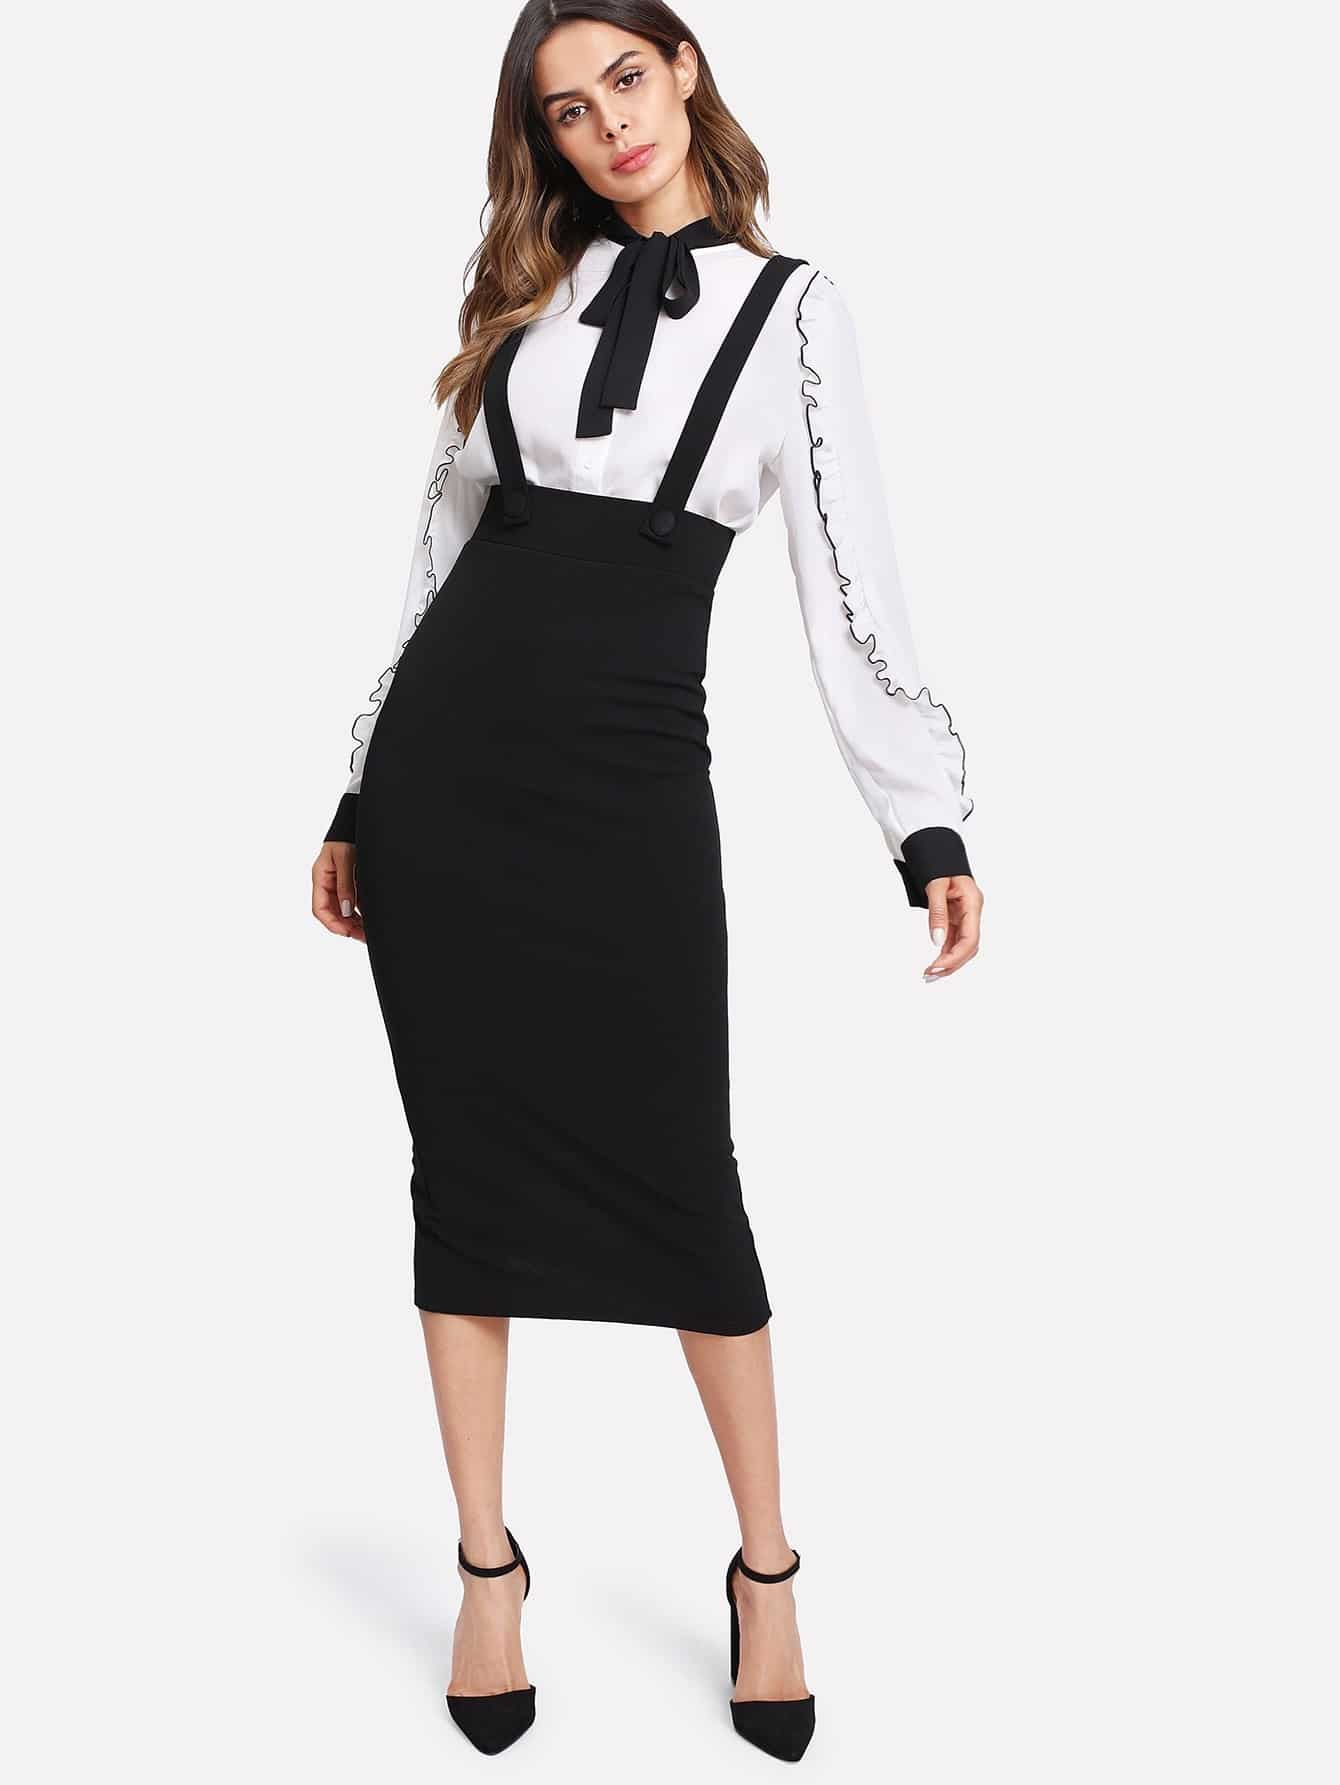 Slit Back Pencil Skirt With Strap grommet lace up slit back pencil skirt